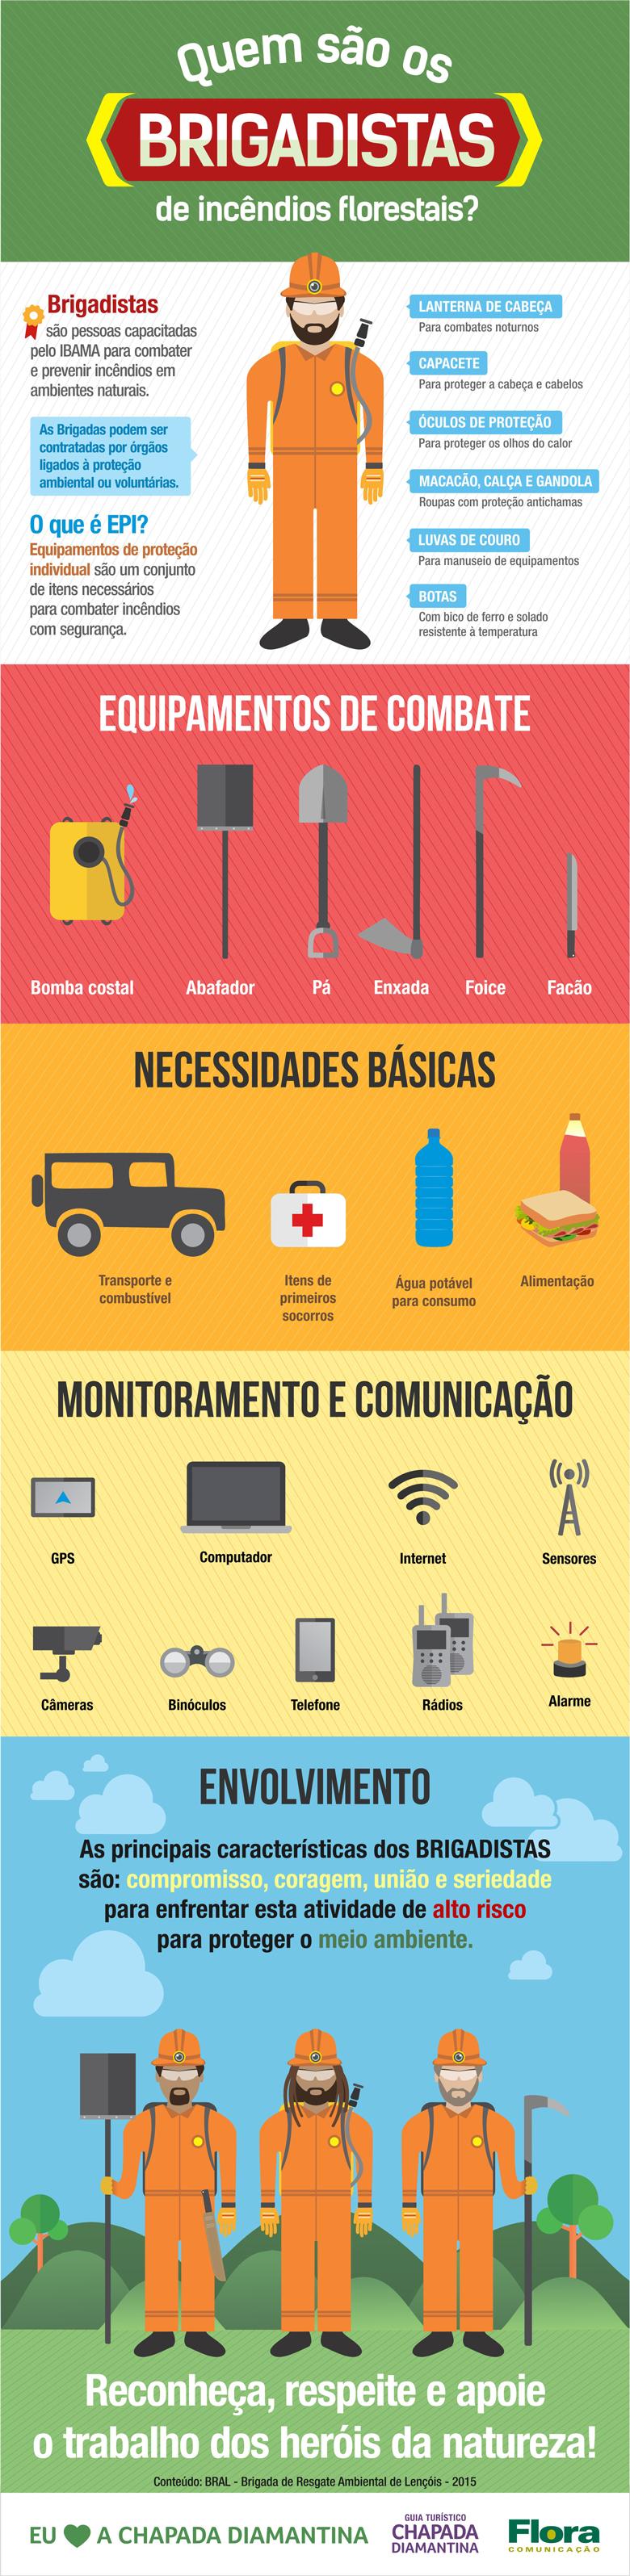 Guia-Chapada-Diamantina-Infografico-Brigadistas